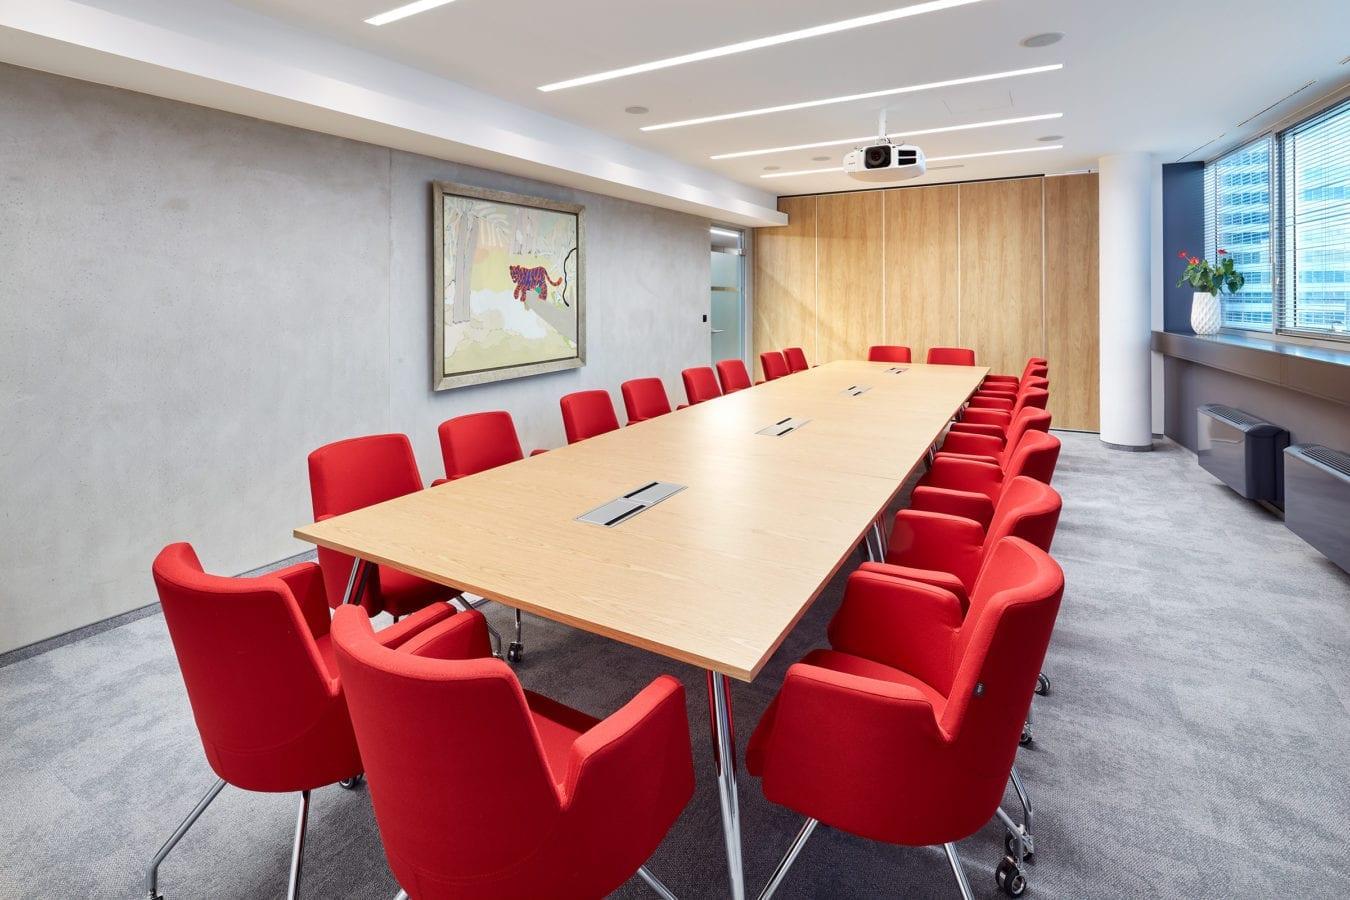 The GESSEL Law Office realizacja INTERBIURO